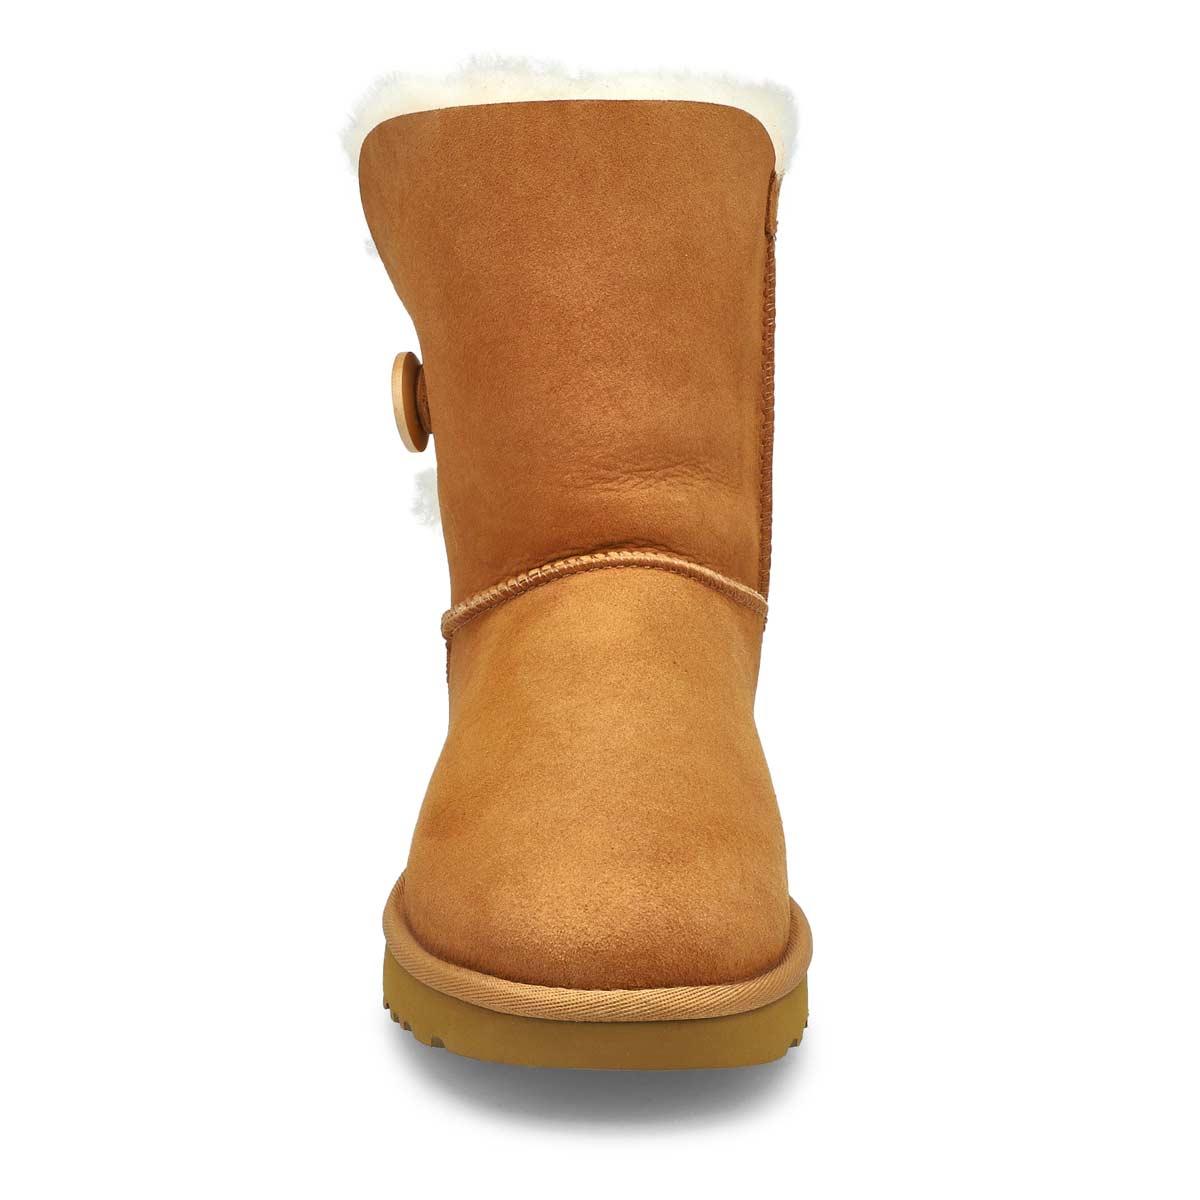 da55d866c9e Women's BAILEY BUTTON II chestnut sheepskin boots